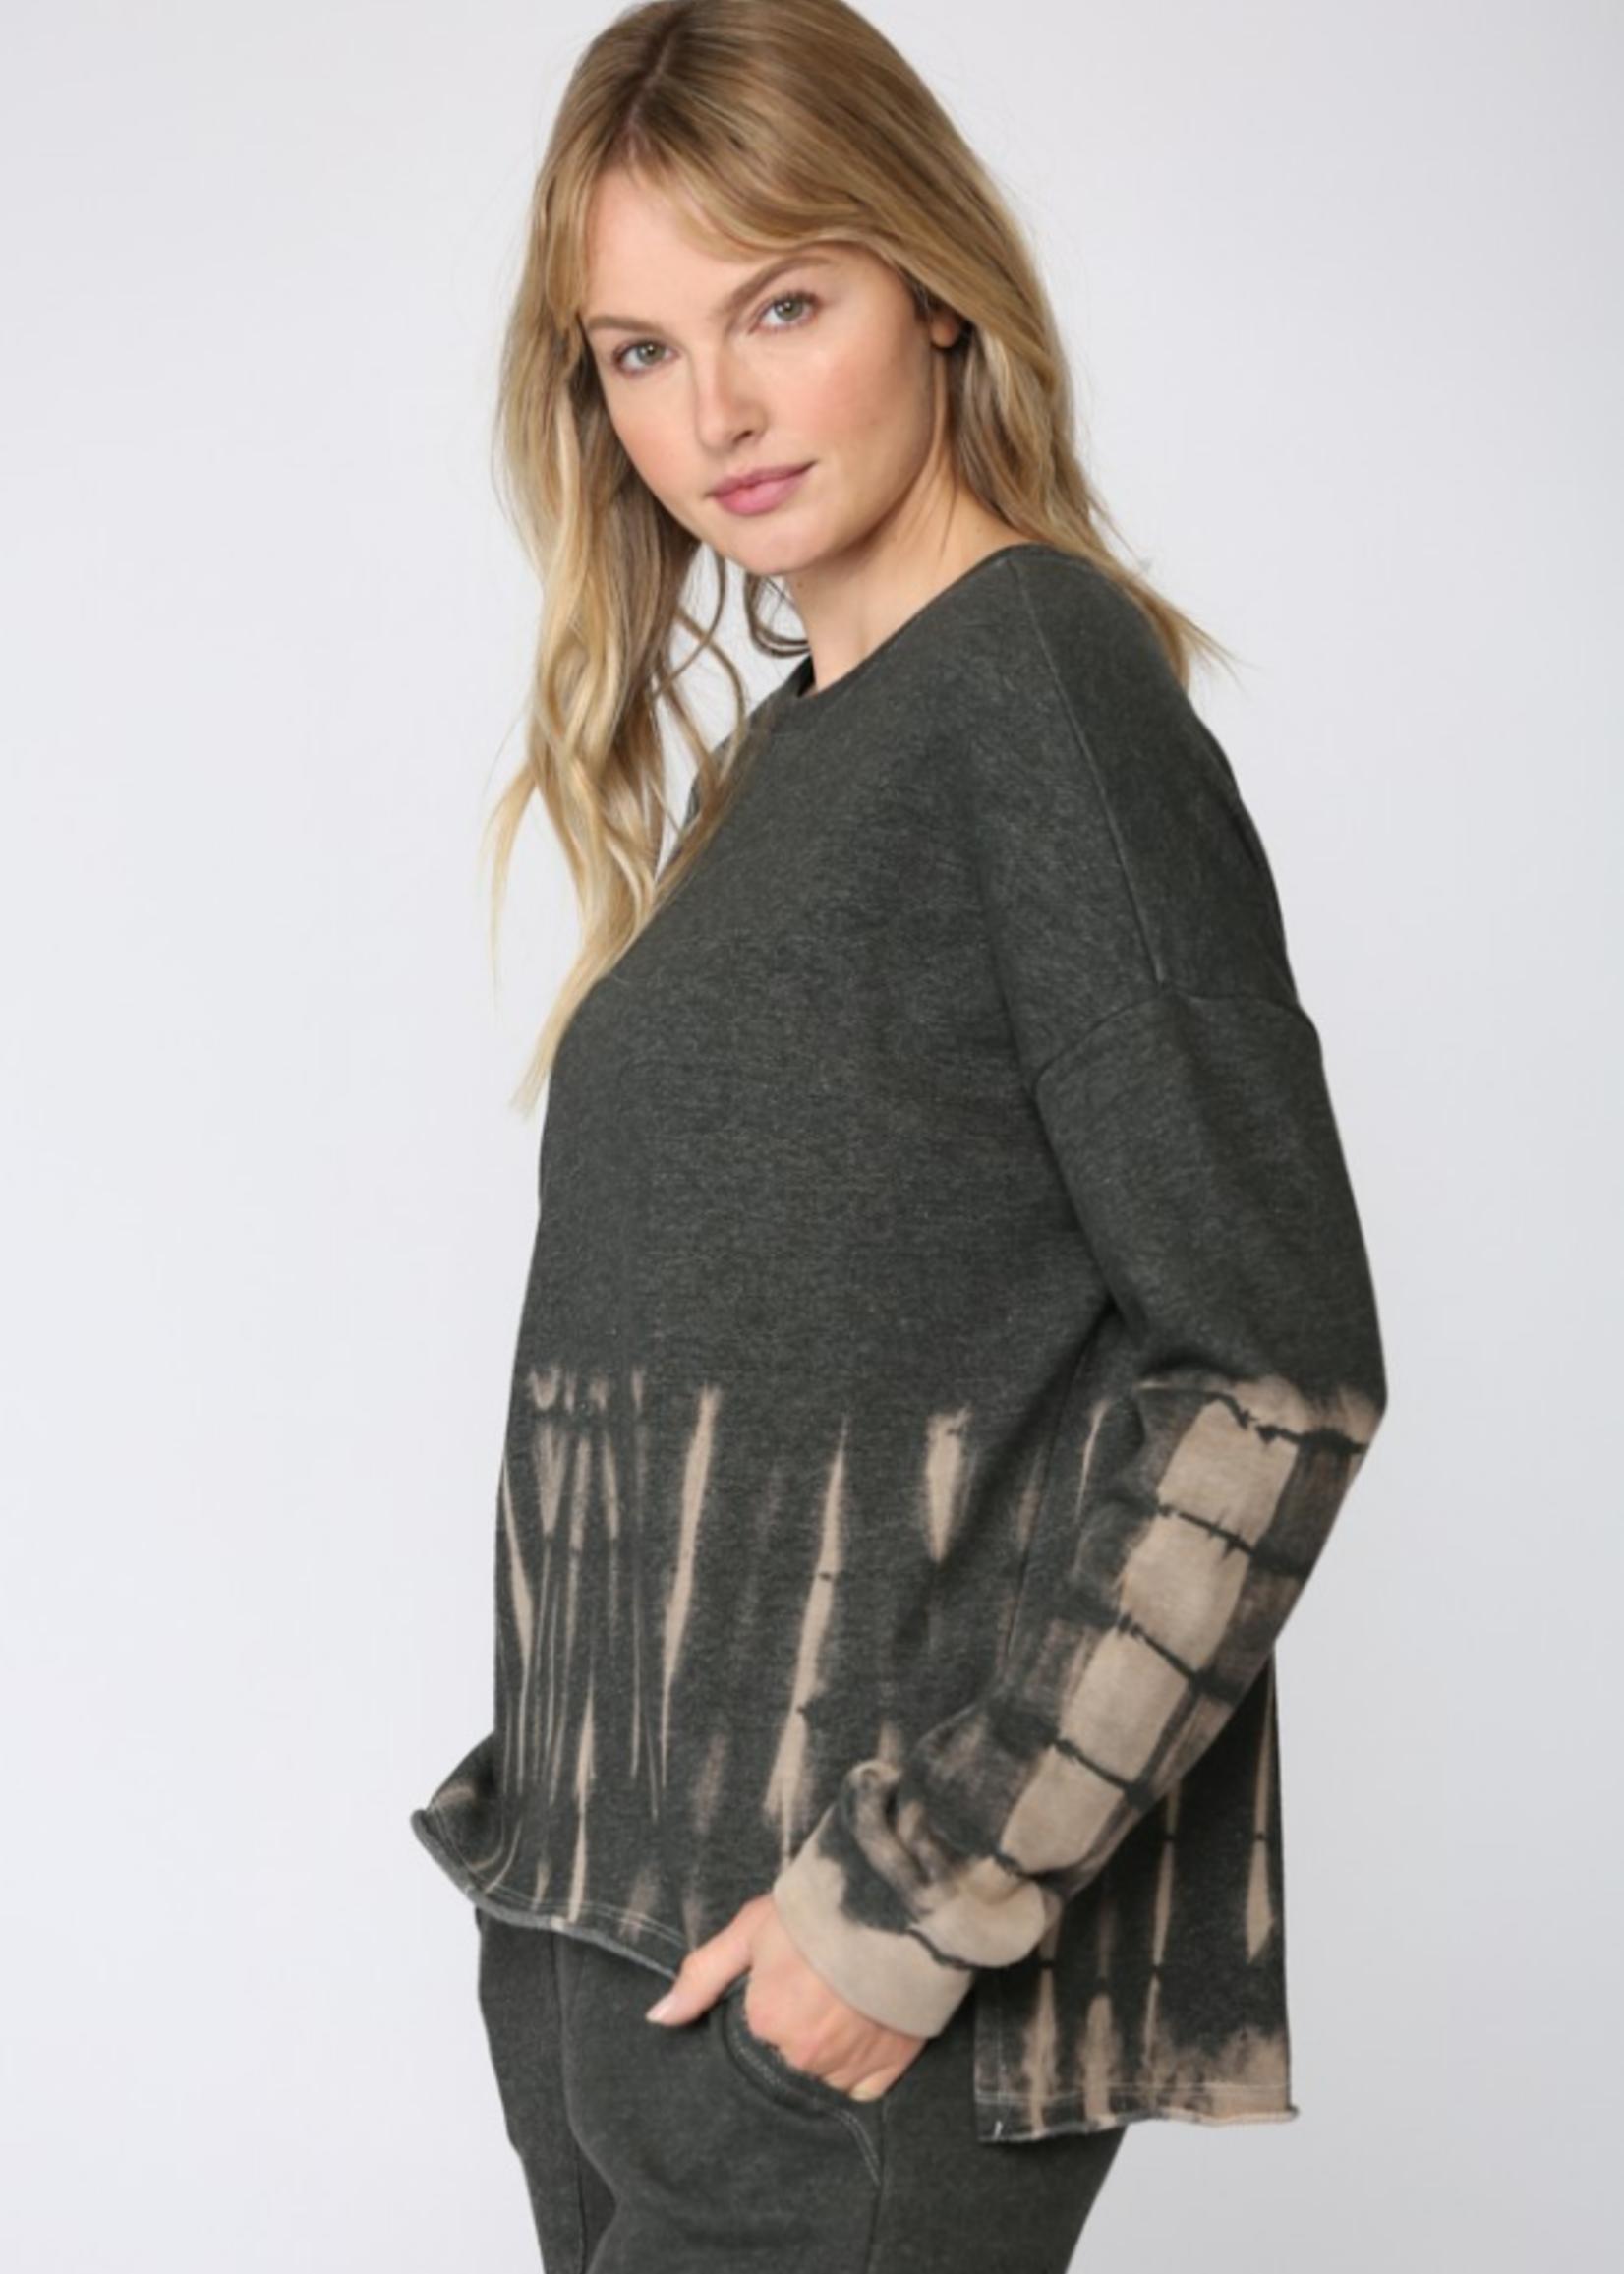 Bleached Tie Dye Sweatshirt - Charcoal